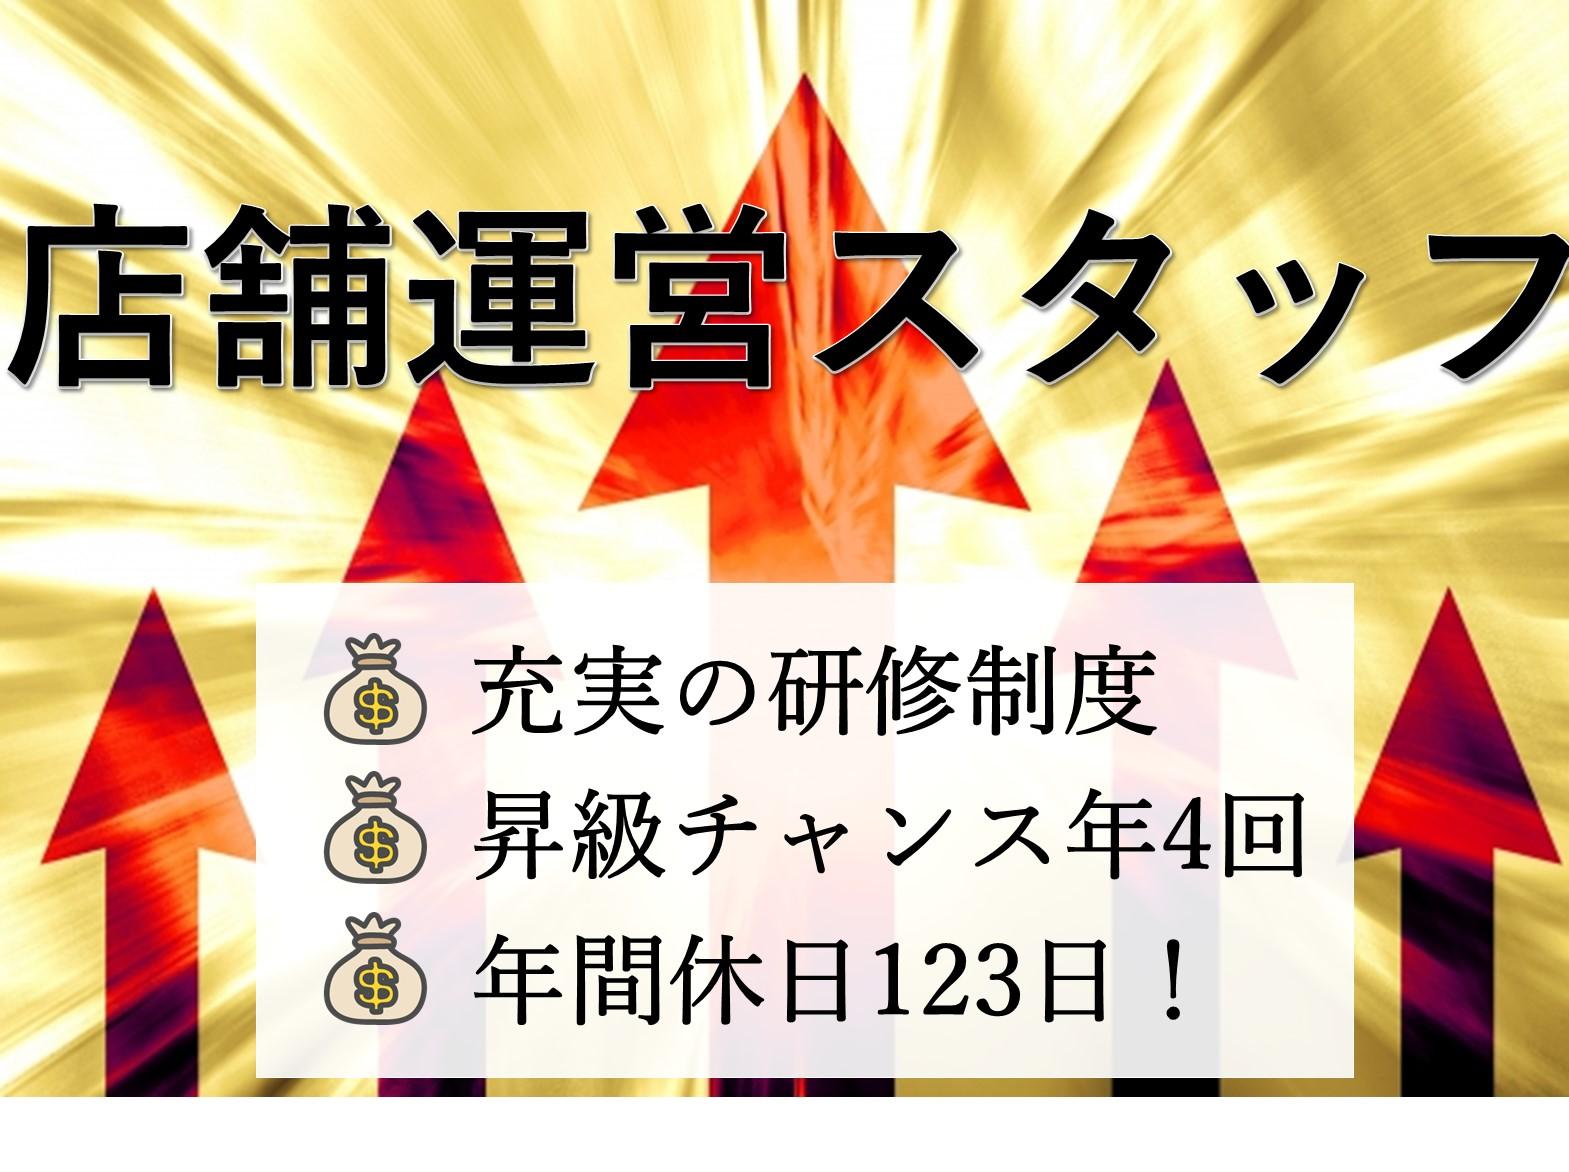 未経験OK!急募【正社員】牛丼屋店舗運営スタッフ★昇進年4回★年休123日★ イメージ